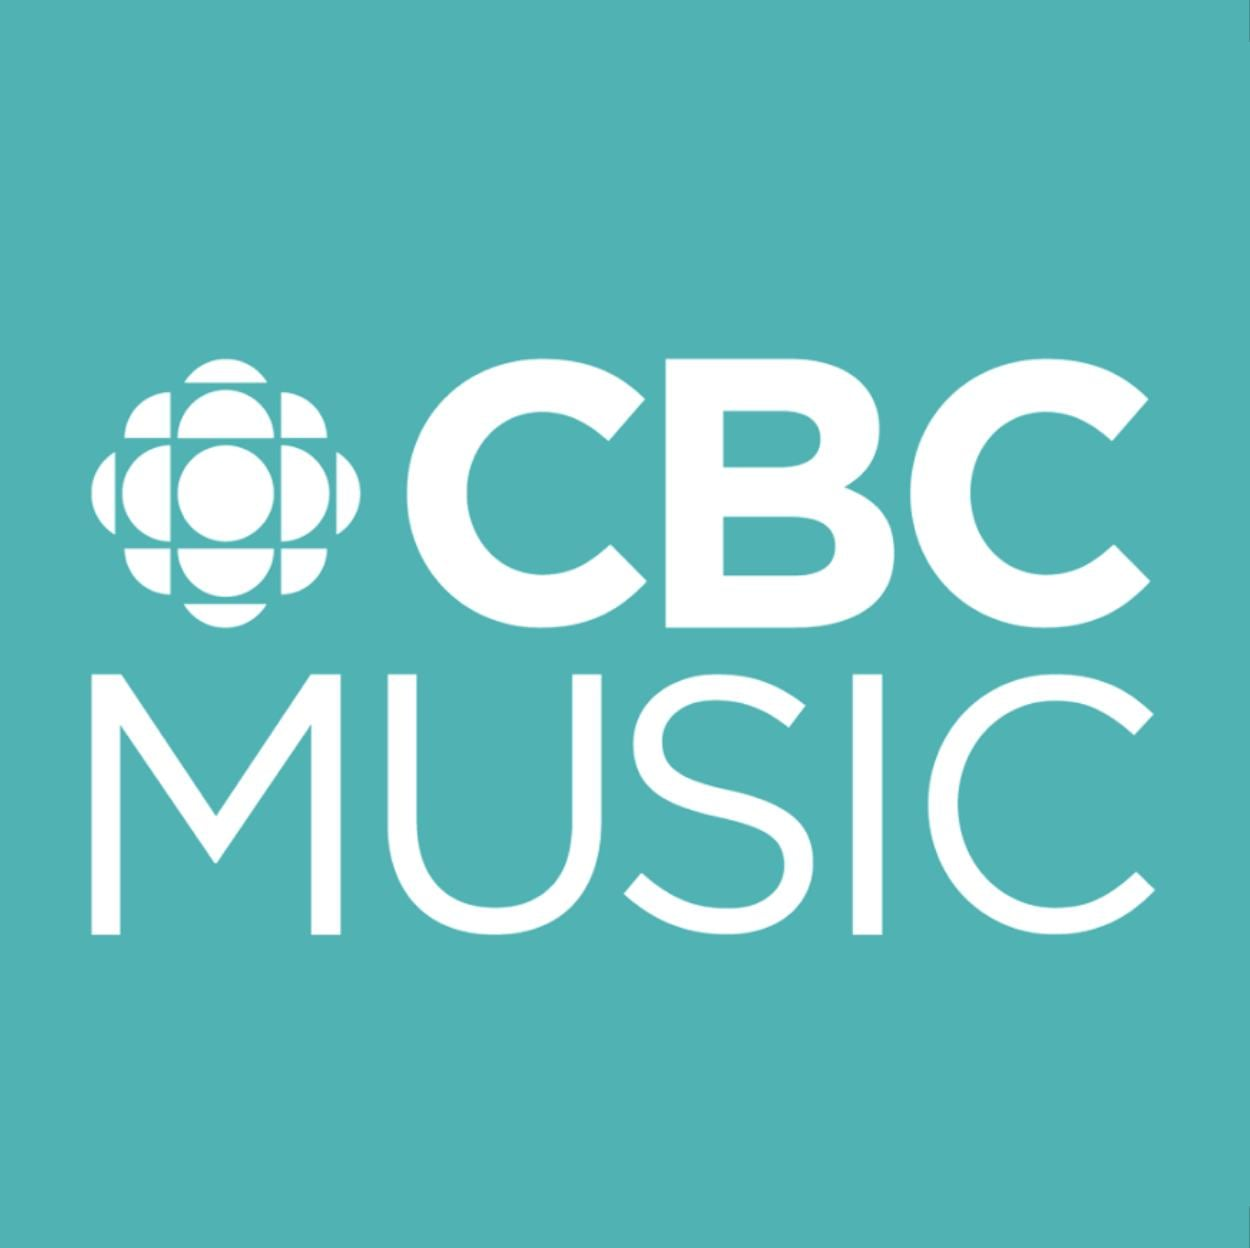 ada46500 Drake's 'God's Plan' reaches 1 billion YouTube views | CBC Music